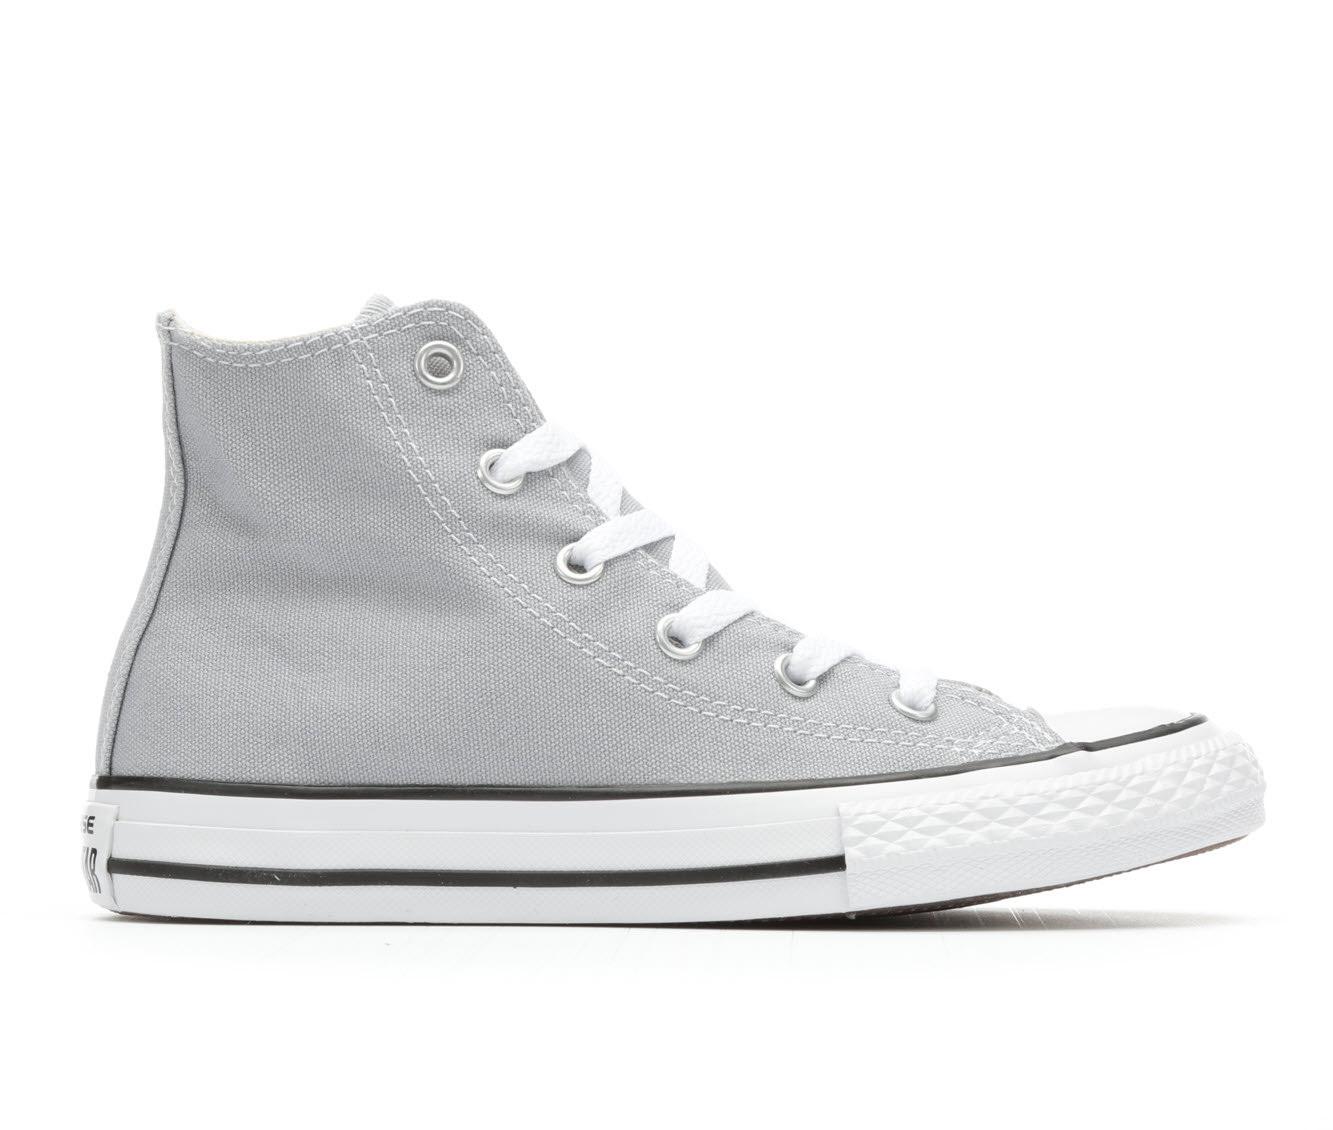 Girls' Converse Chuck Taylor All Star Seasonal Hi Sneakers (Grey)